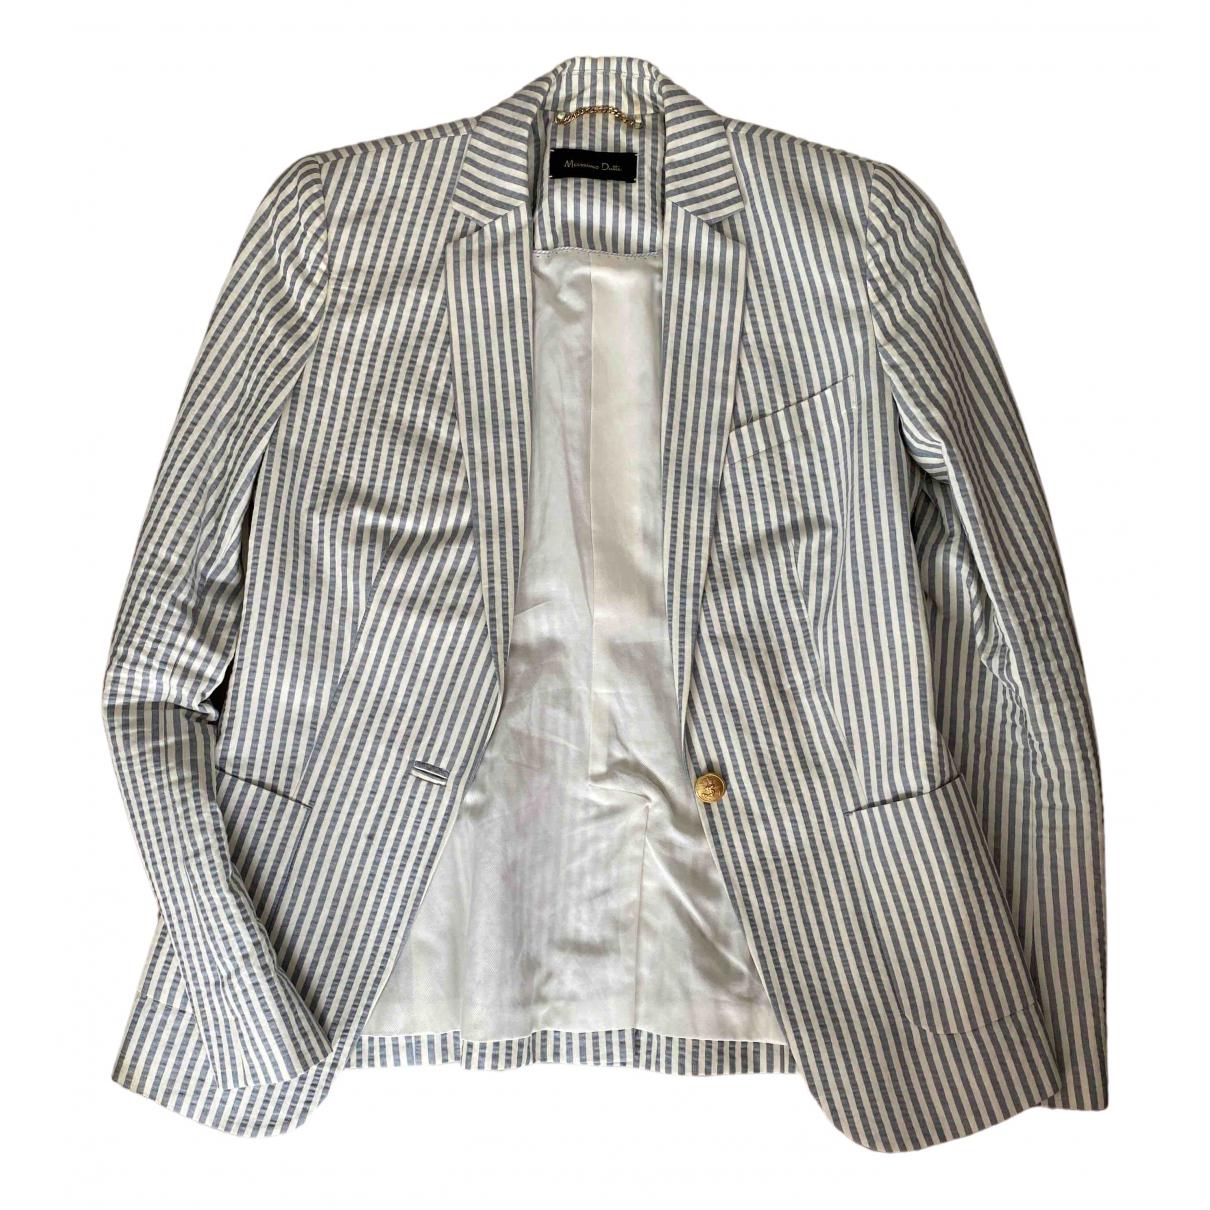 Massimo Dutti \N Blue jacket for Women 36 FR